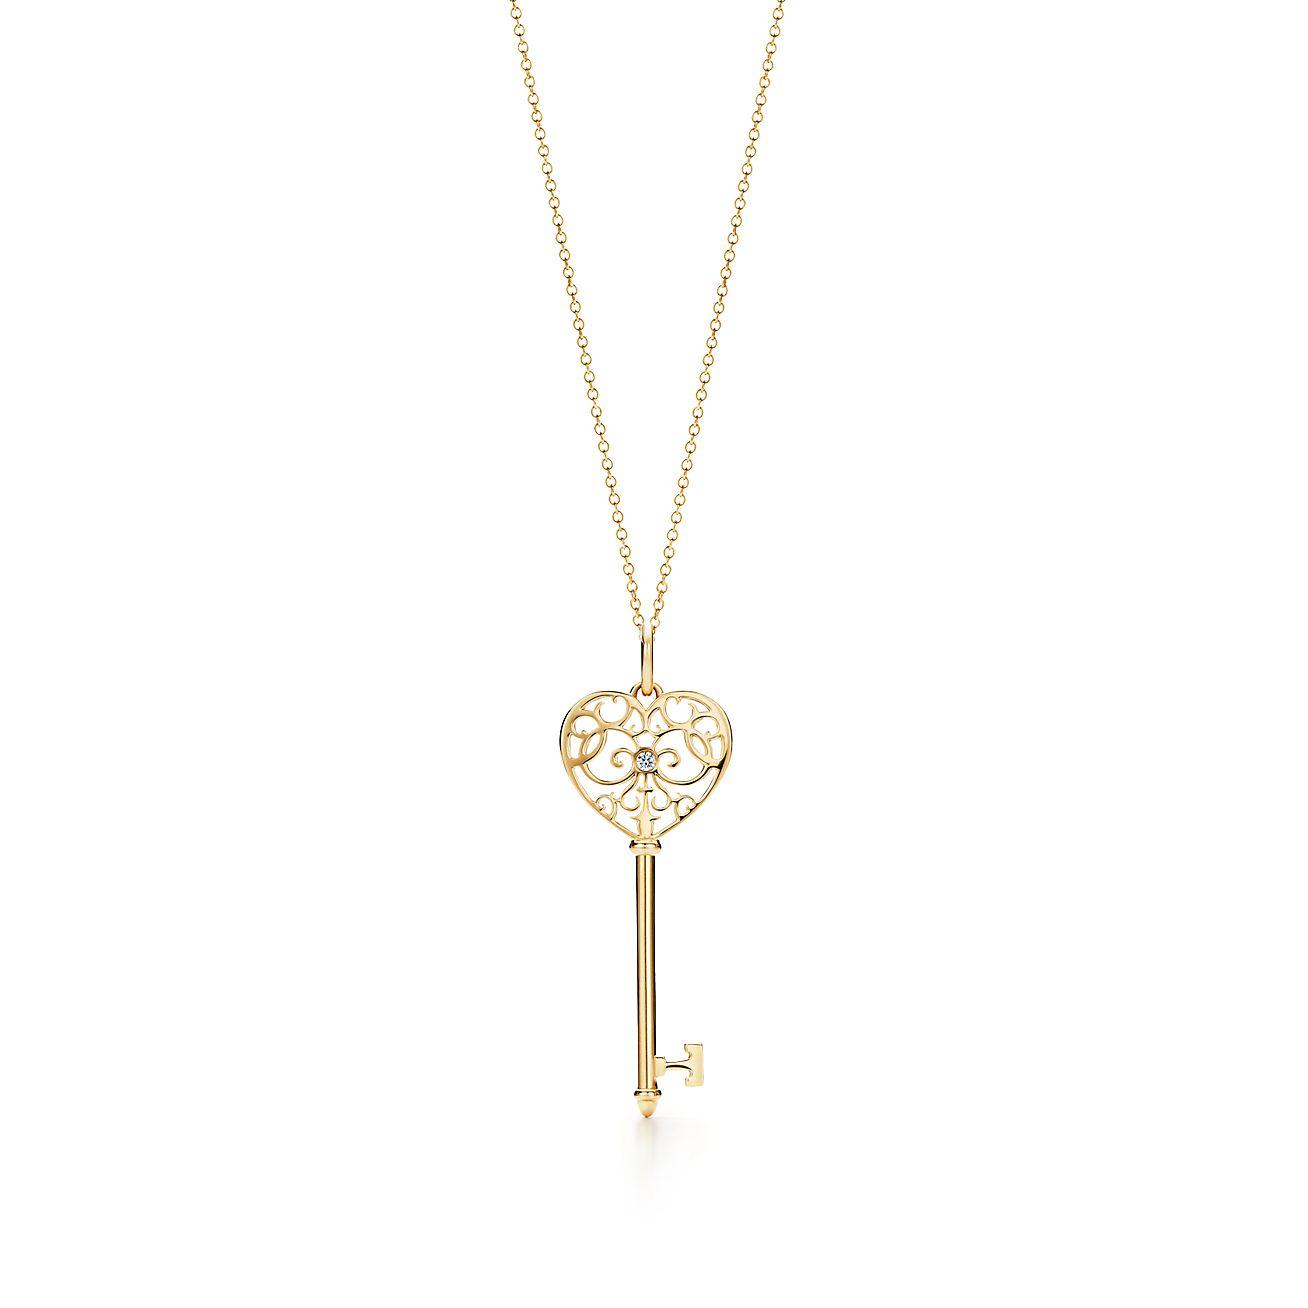 Tiffany enchant heart key pendant in 18k gold with diamonds tiffany enchantheart key pendant aloadofball Gallery